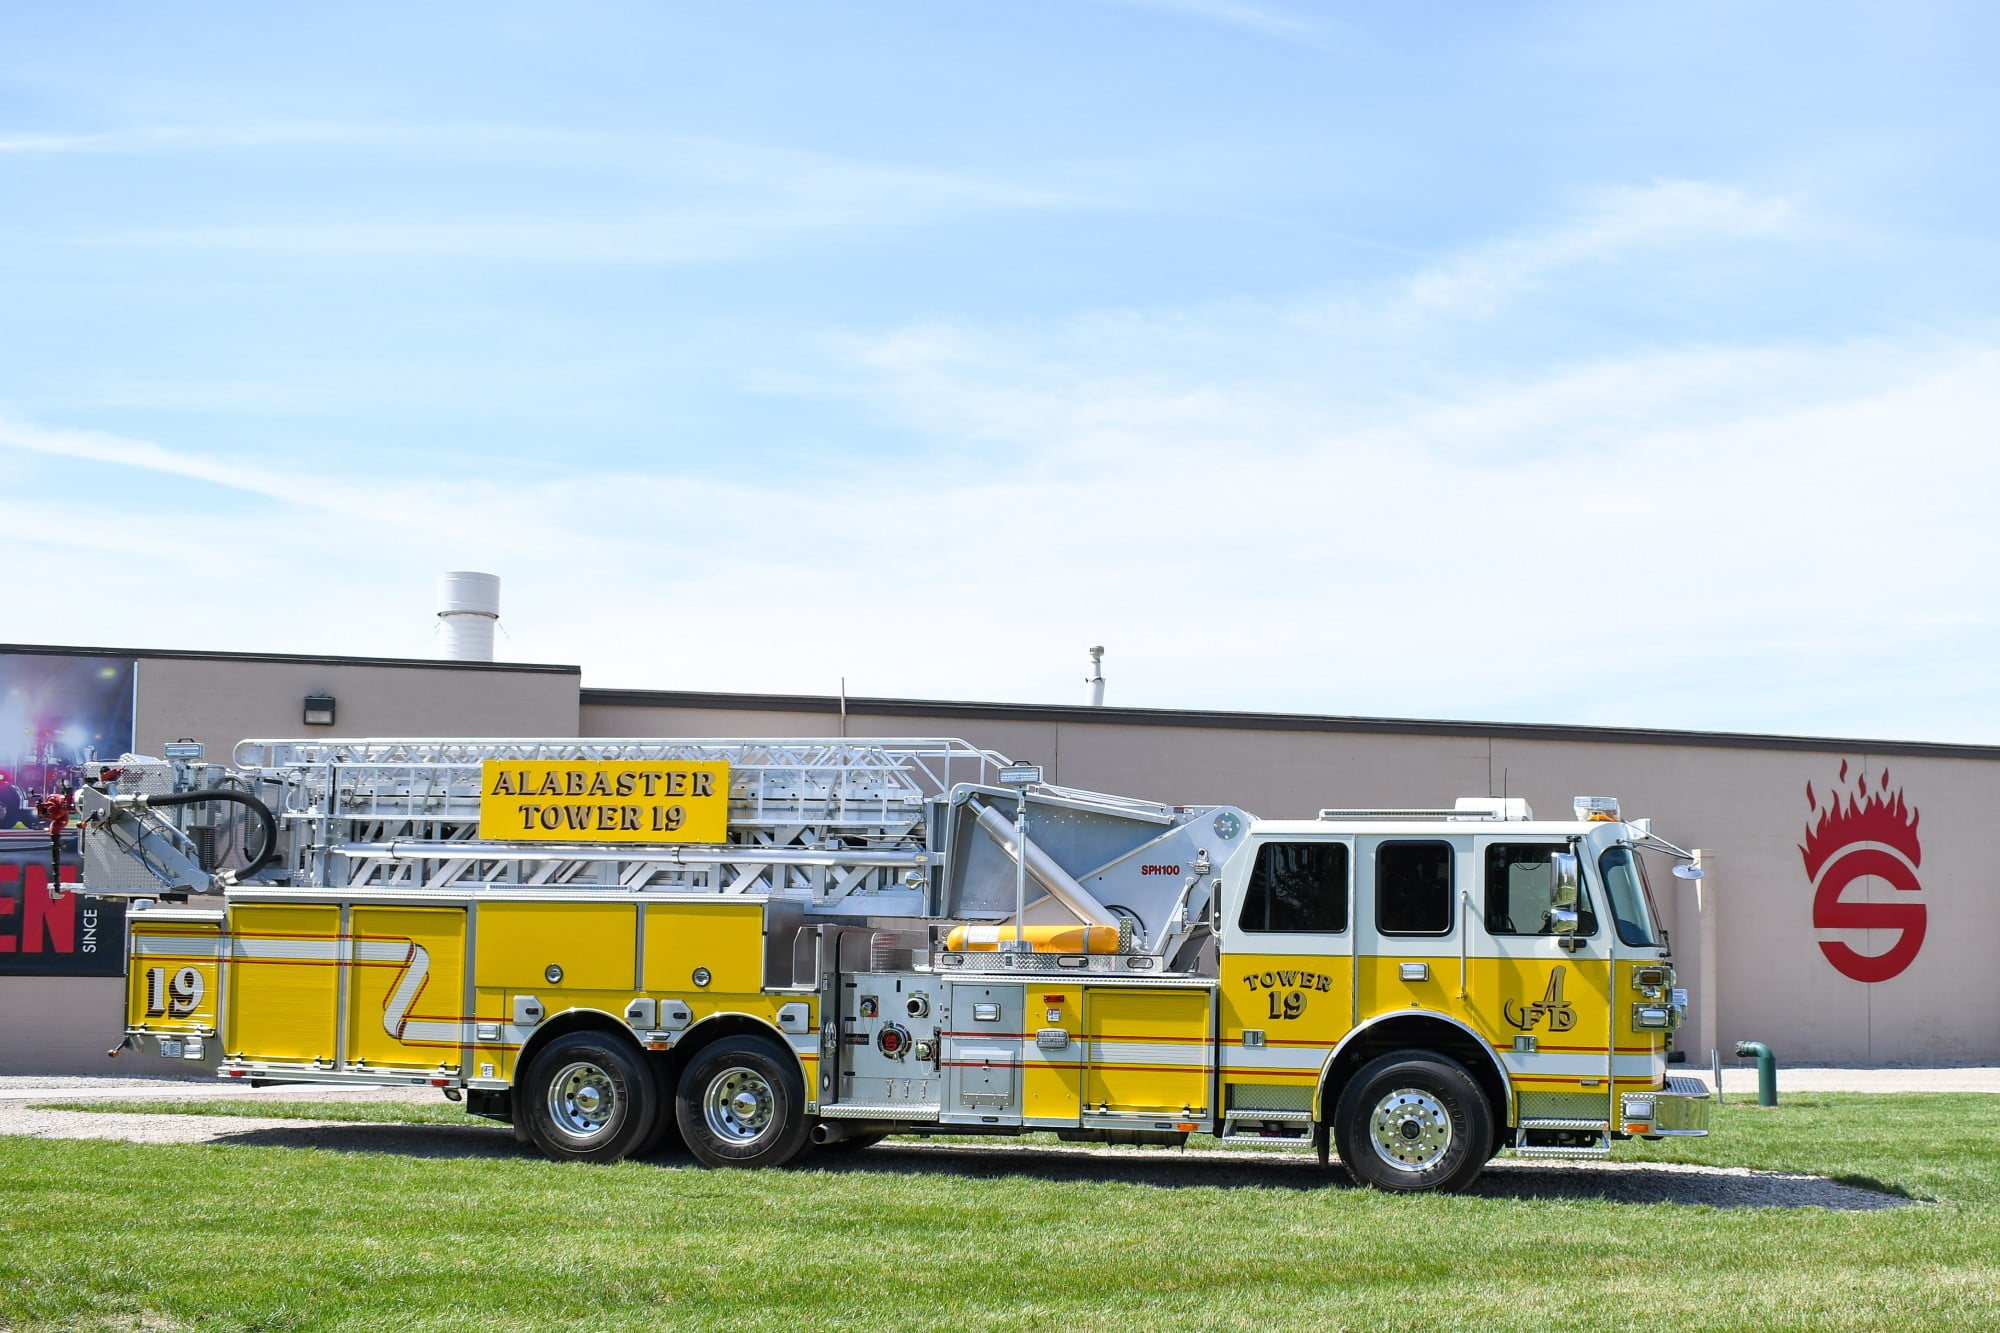 Alabaster Fire Department